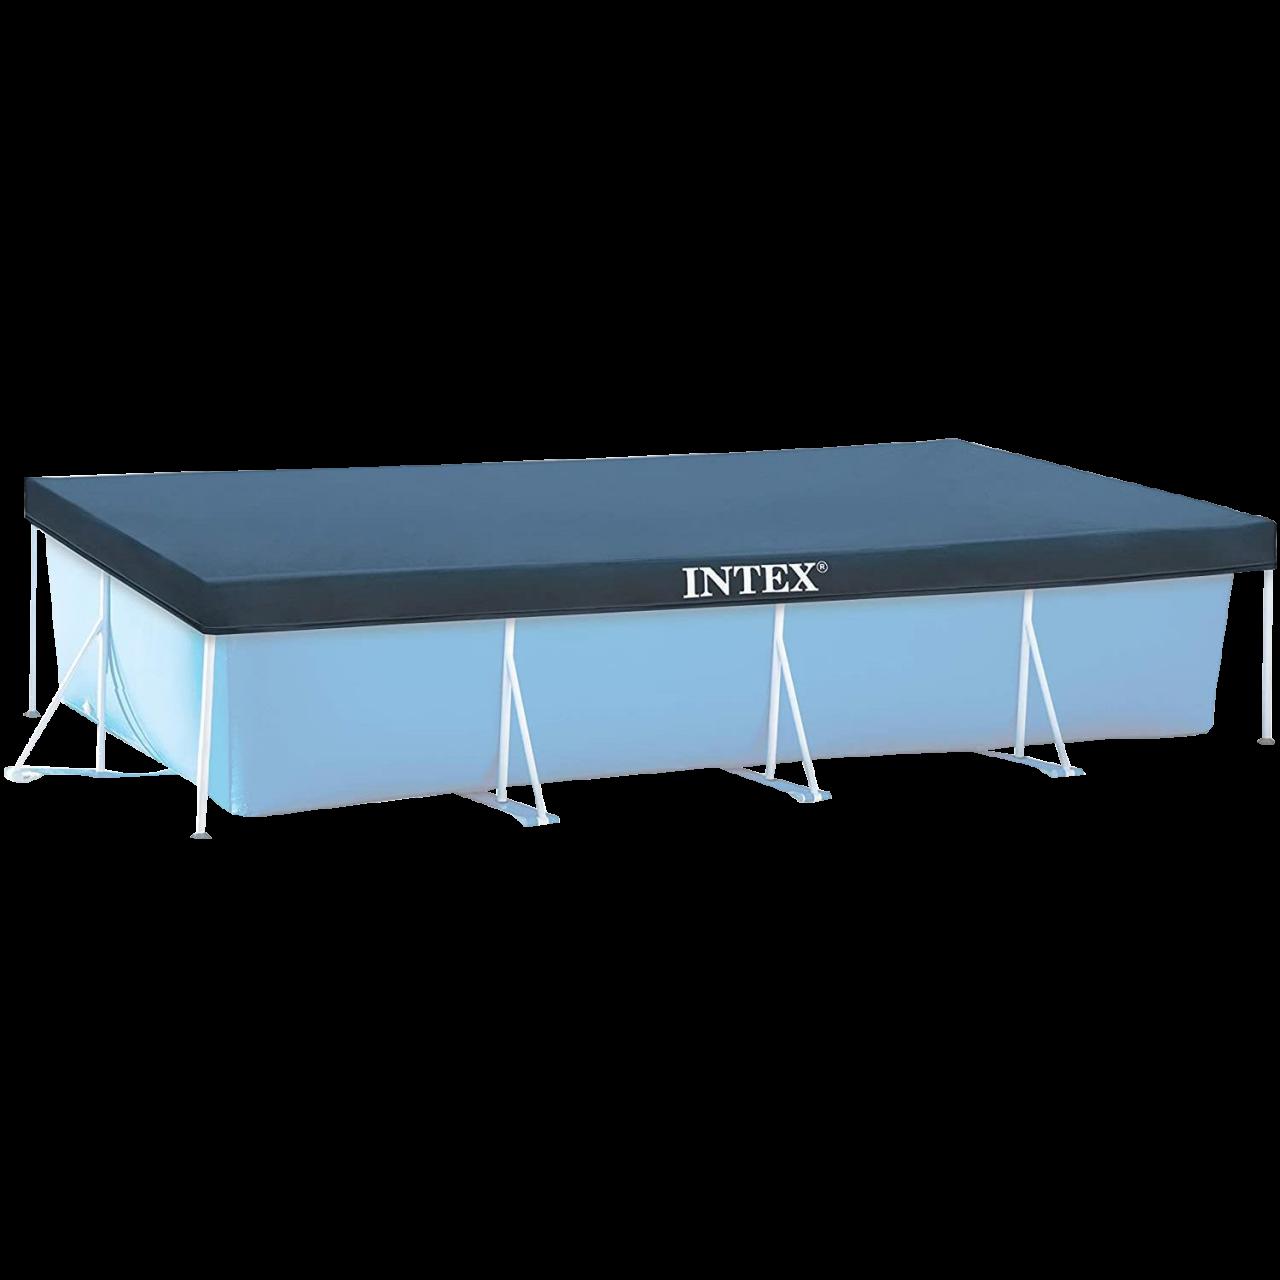 Intex Abdeckplane 450x220cm Frame Pool Poolplane Cover Poolabdeckung 28039